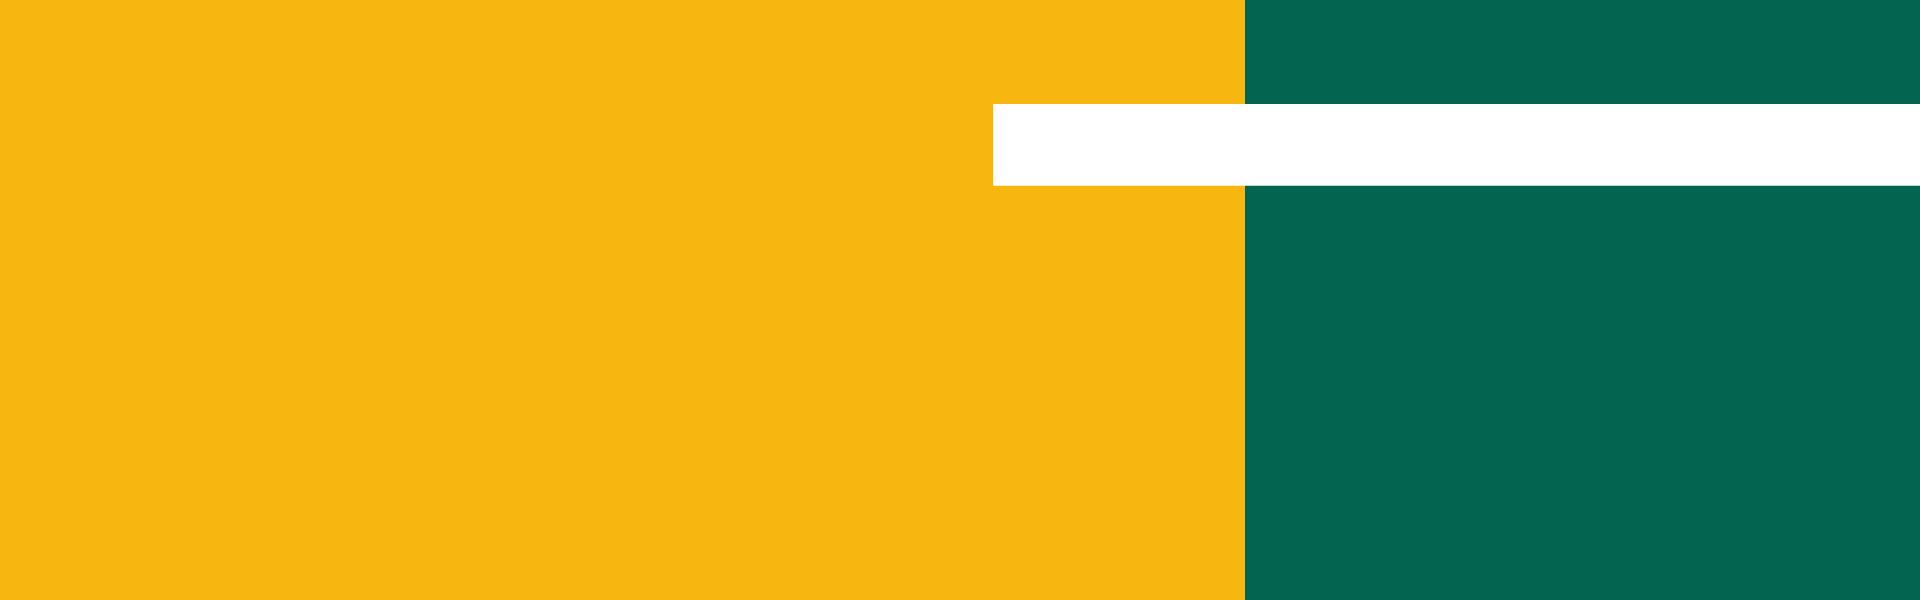 Banner - TOPO HOME - Comunicado Fim semestre